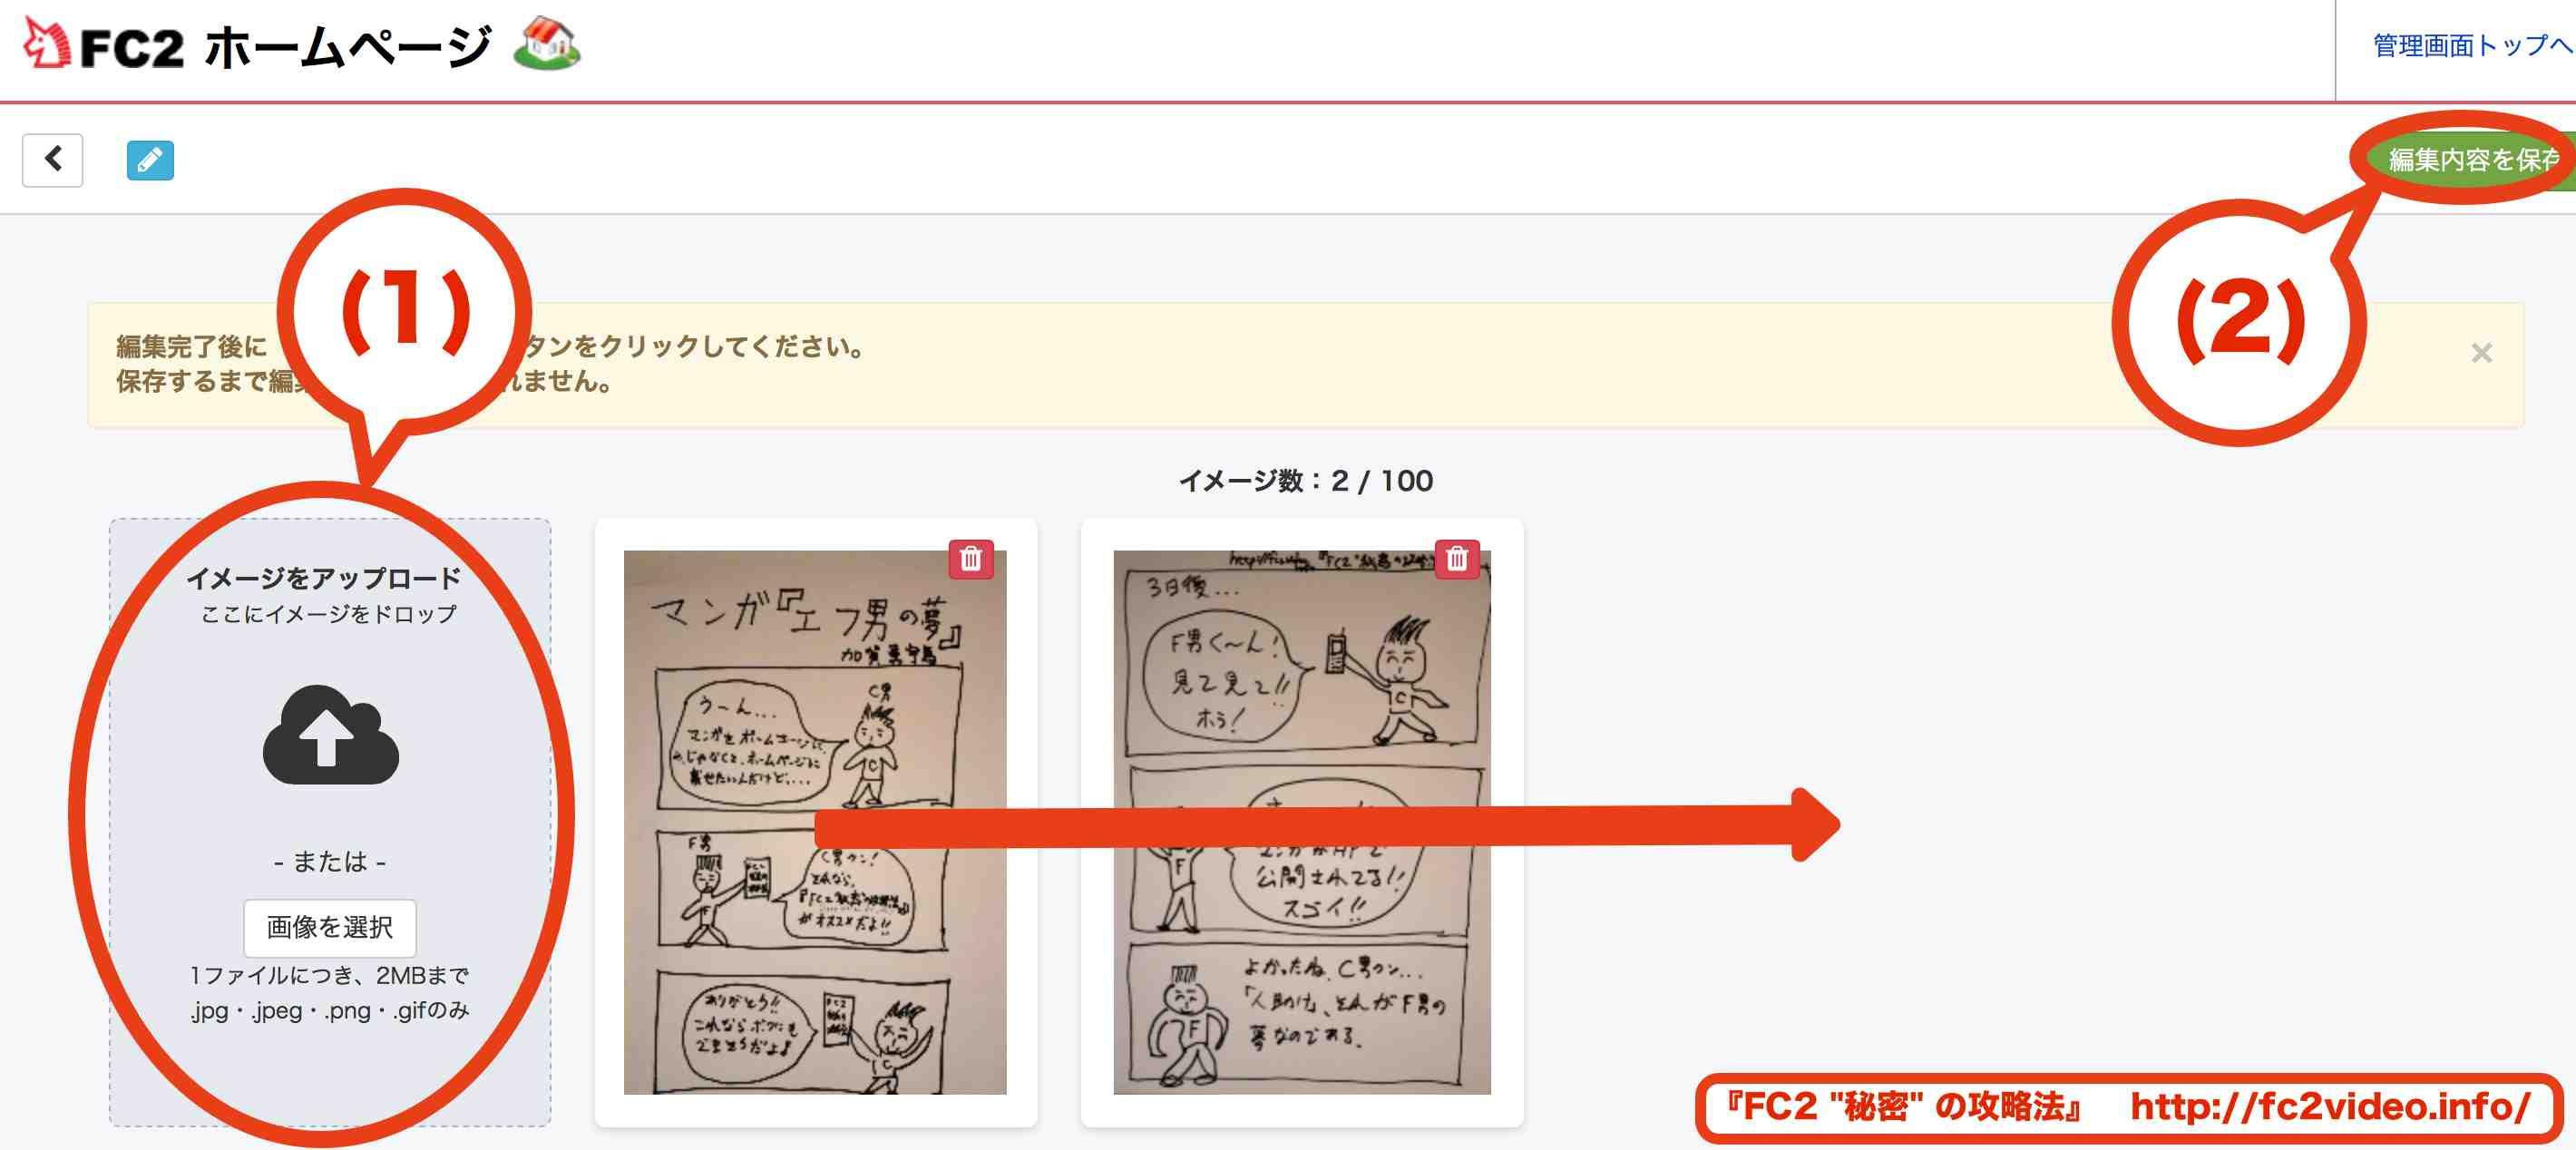 FC2ホームページにWEB漫画を載せる方法8